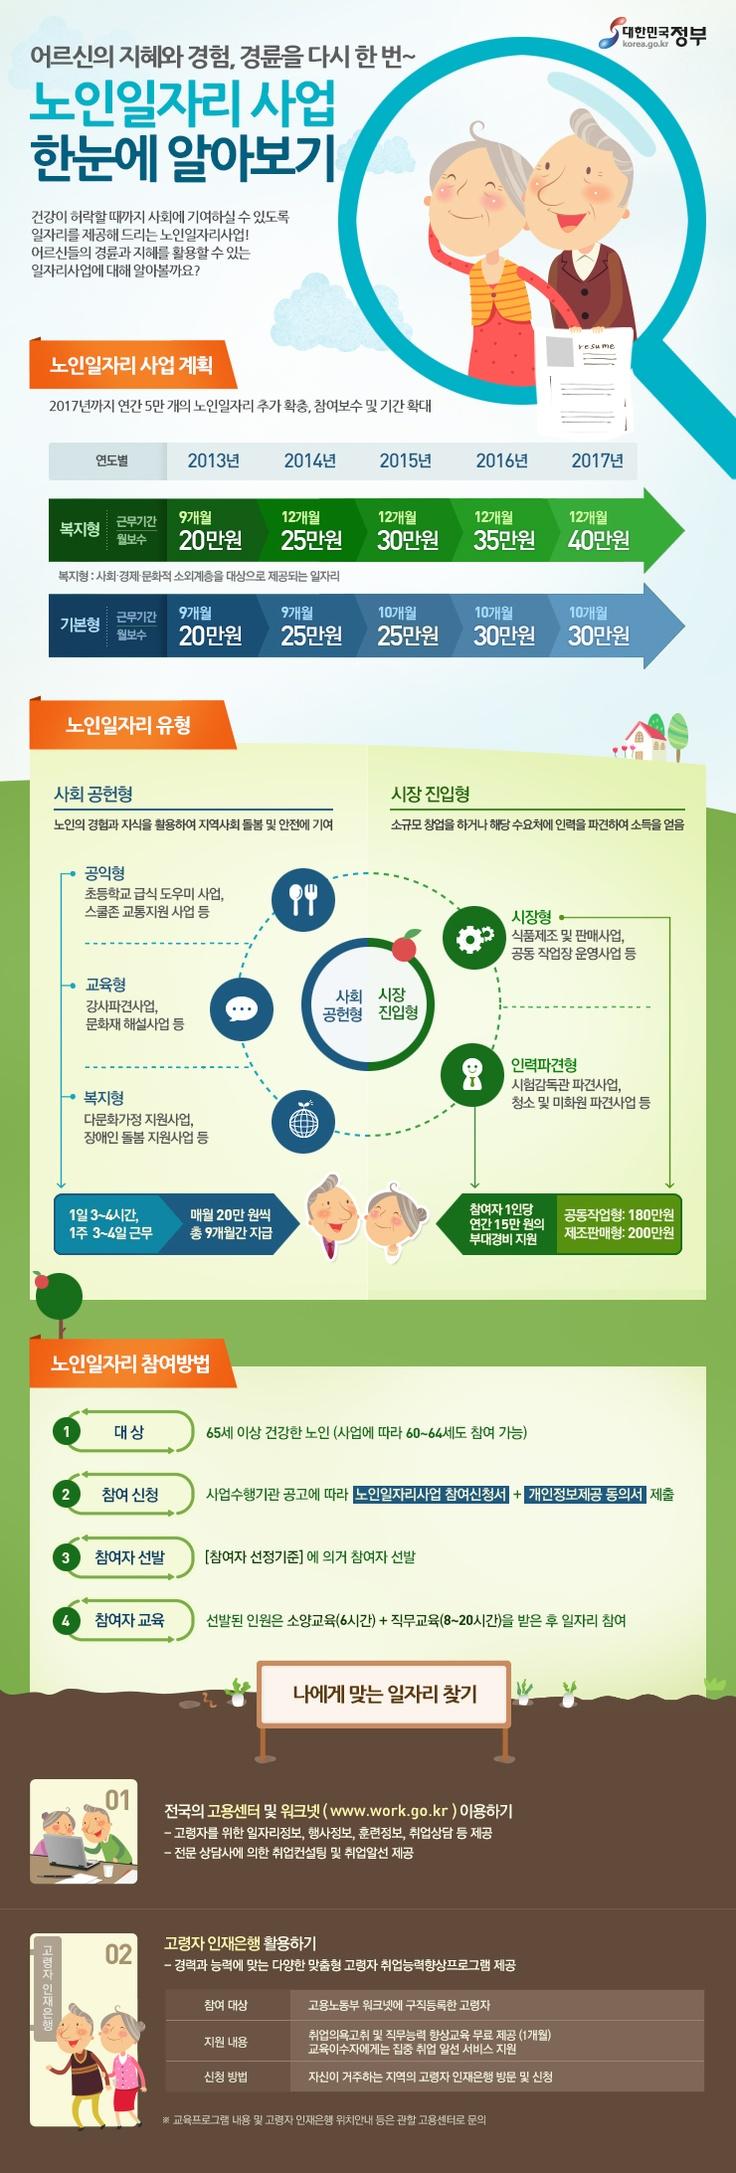 [Infographic] '지혜와 경험, 경륜을 다시 한 번~!' 노인 일자리사업에 관한 인포그래픽